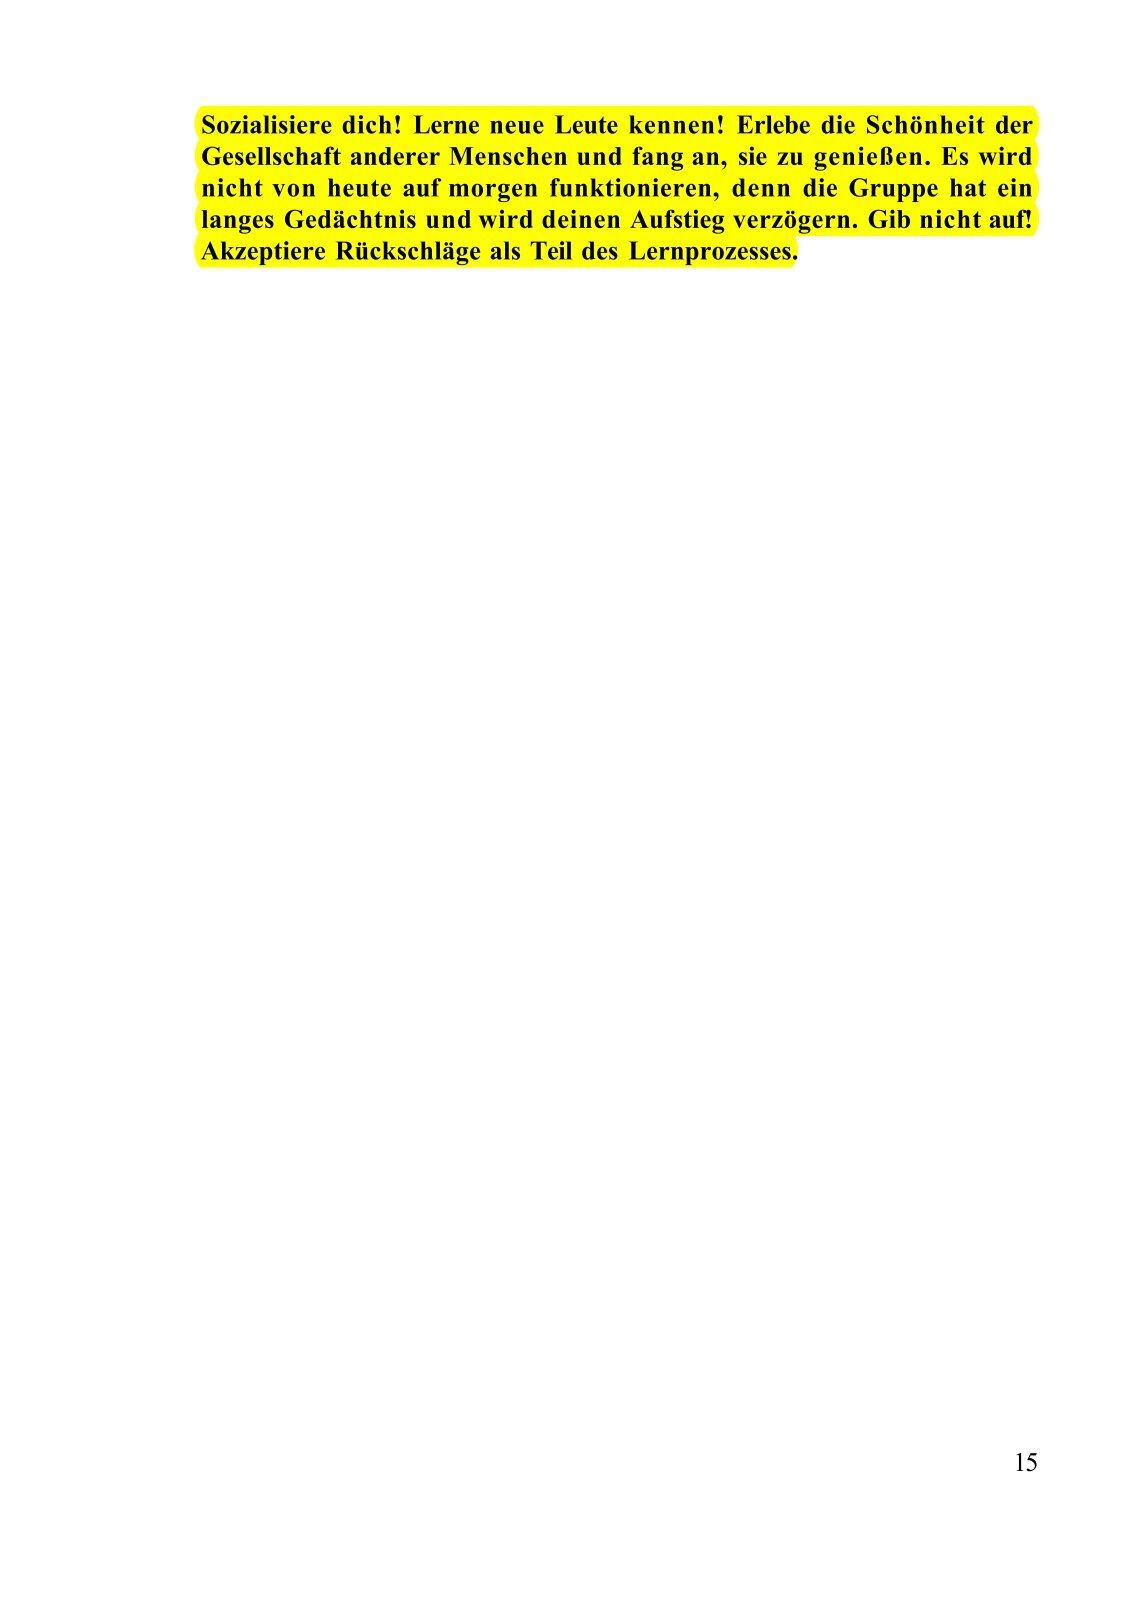 Dem sexismus pdf lob LOB SEXISMUS